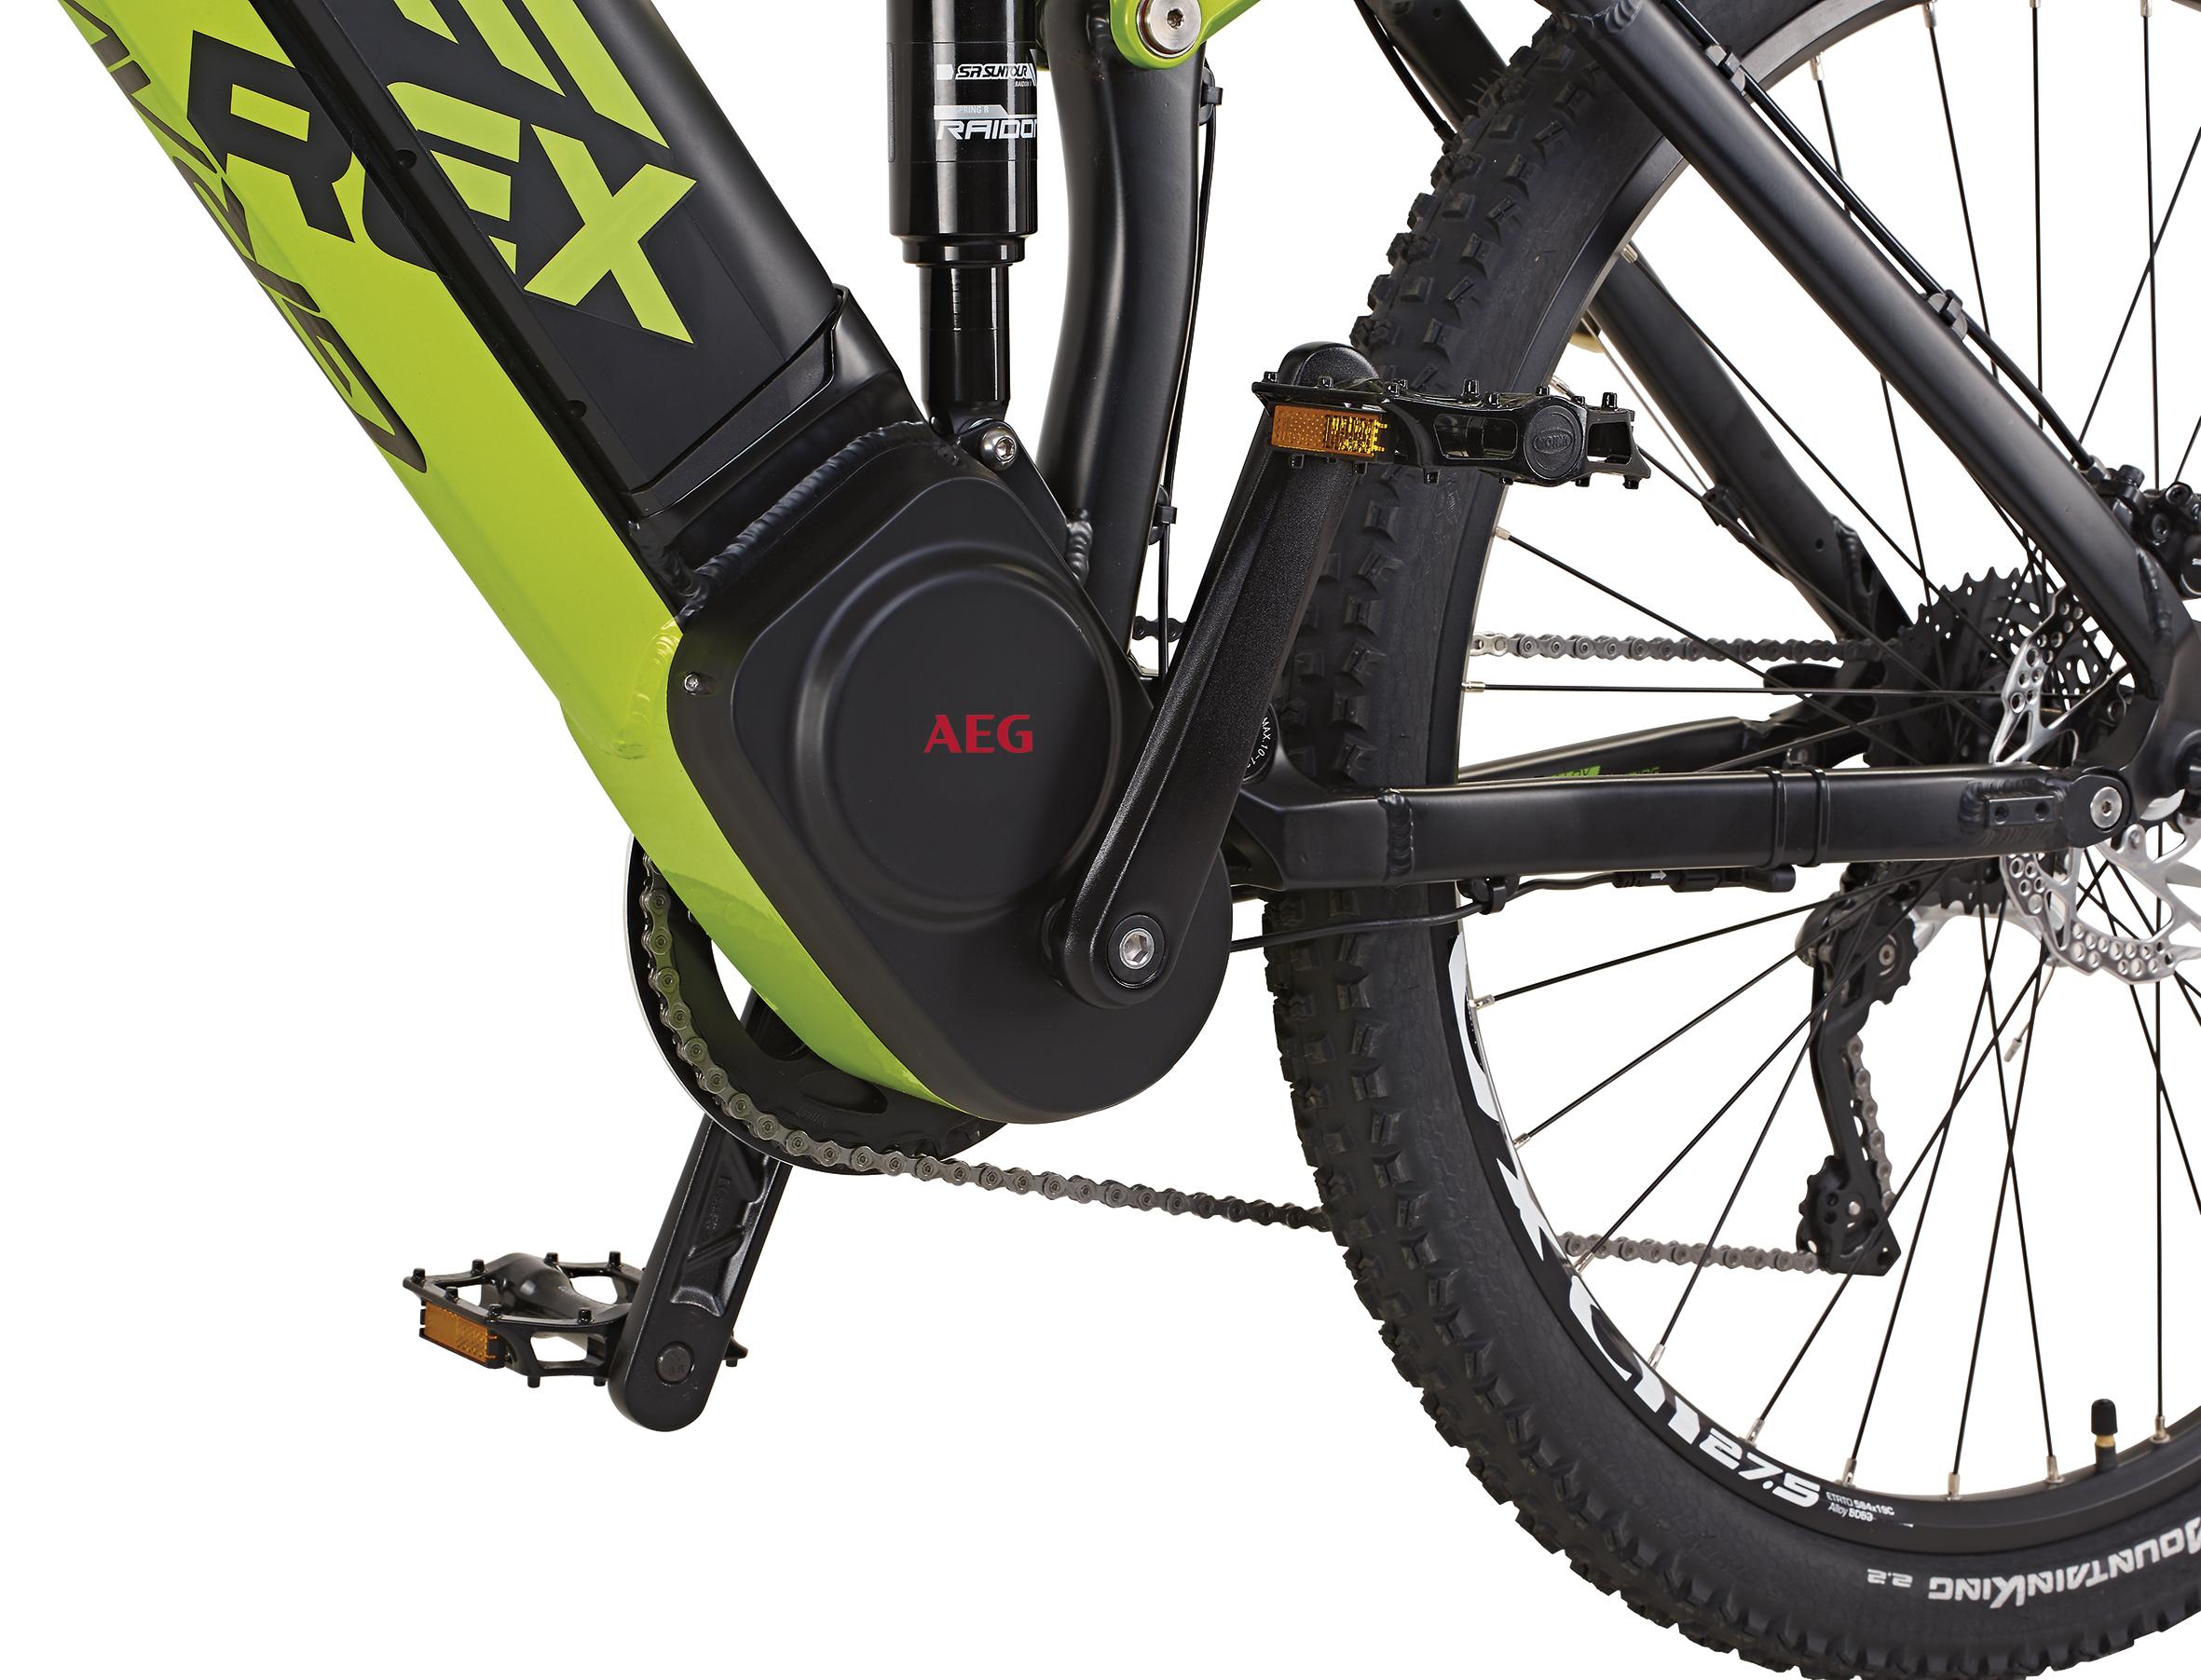 rex e bike alu full suspension e mtb 650b 27 5 graveler e8 9 your online bicycle shop. Black Bedroom Furniture Sets. Home Design Ideas